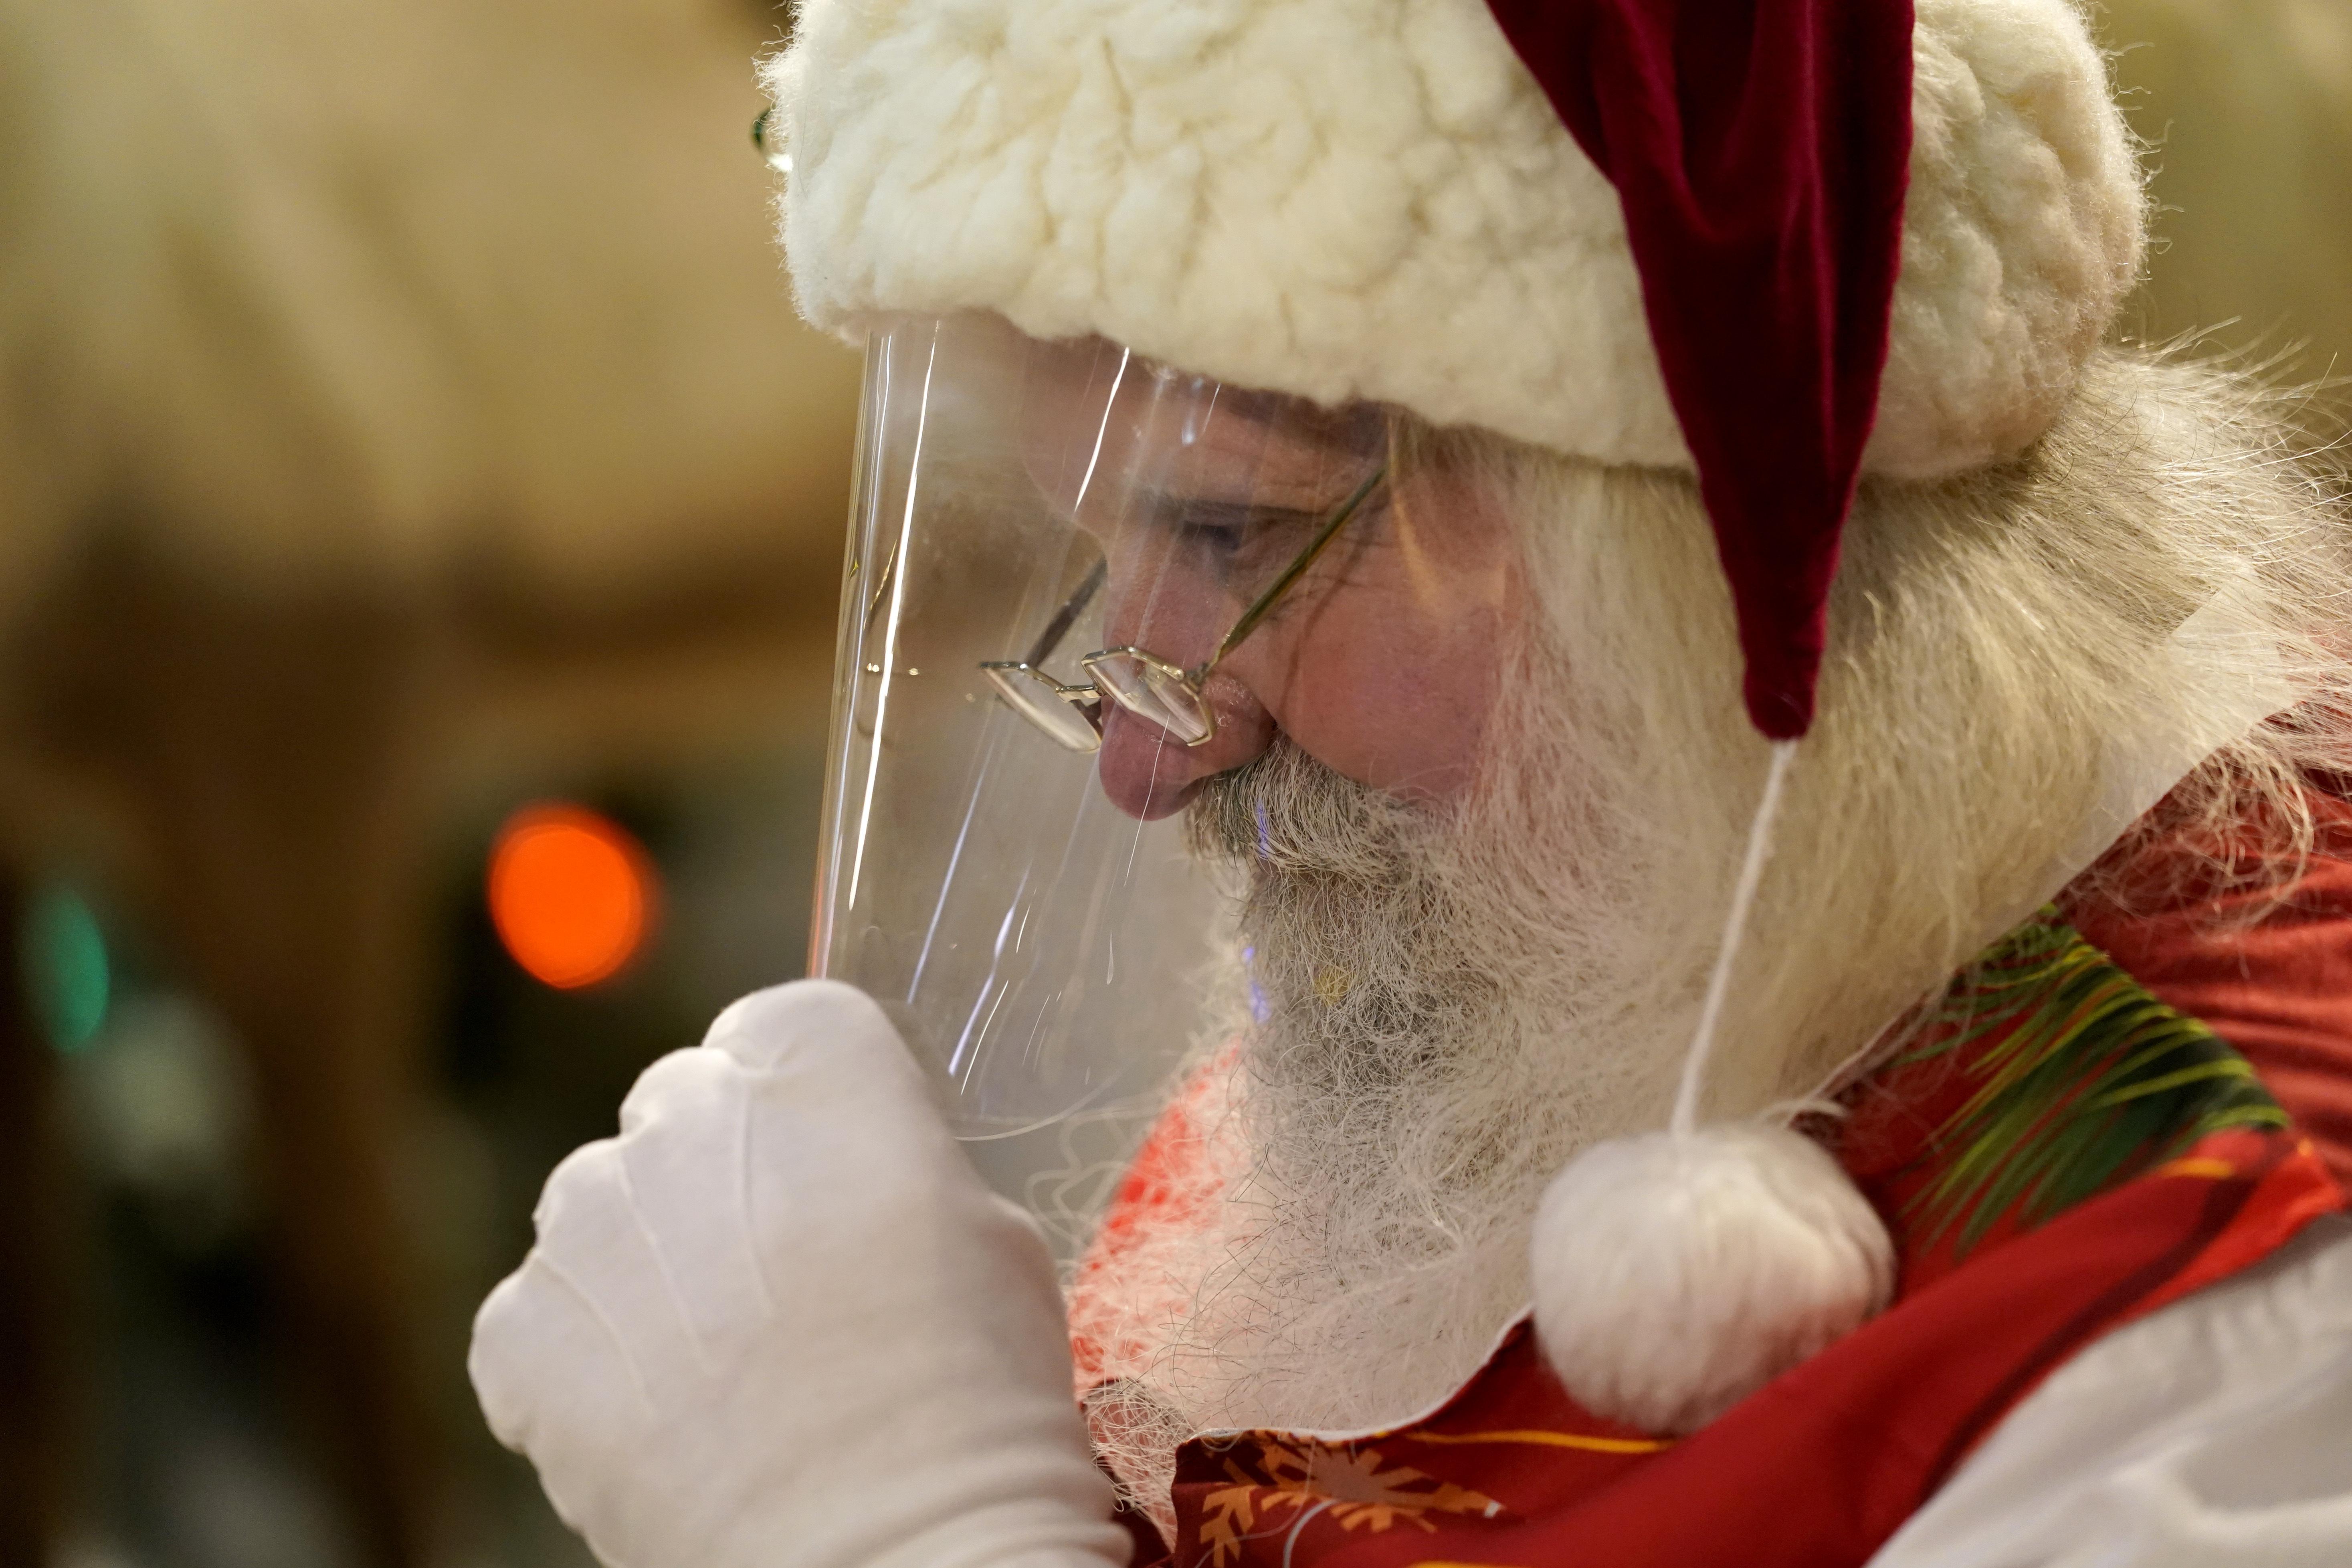 Ho, ho - Whoa! Virus keeping most Santas at a distance